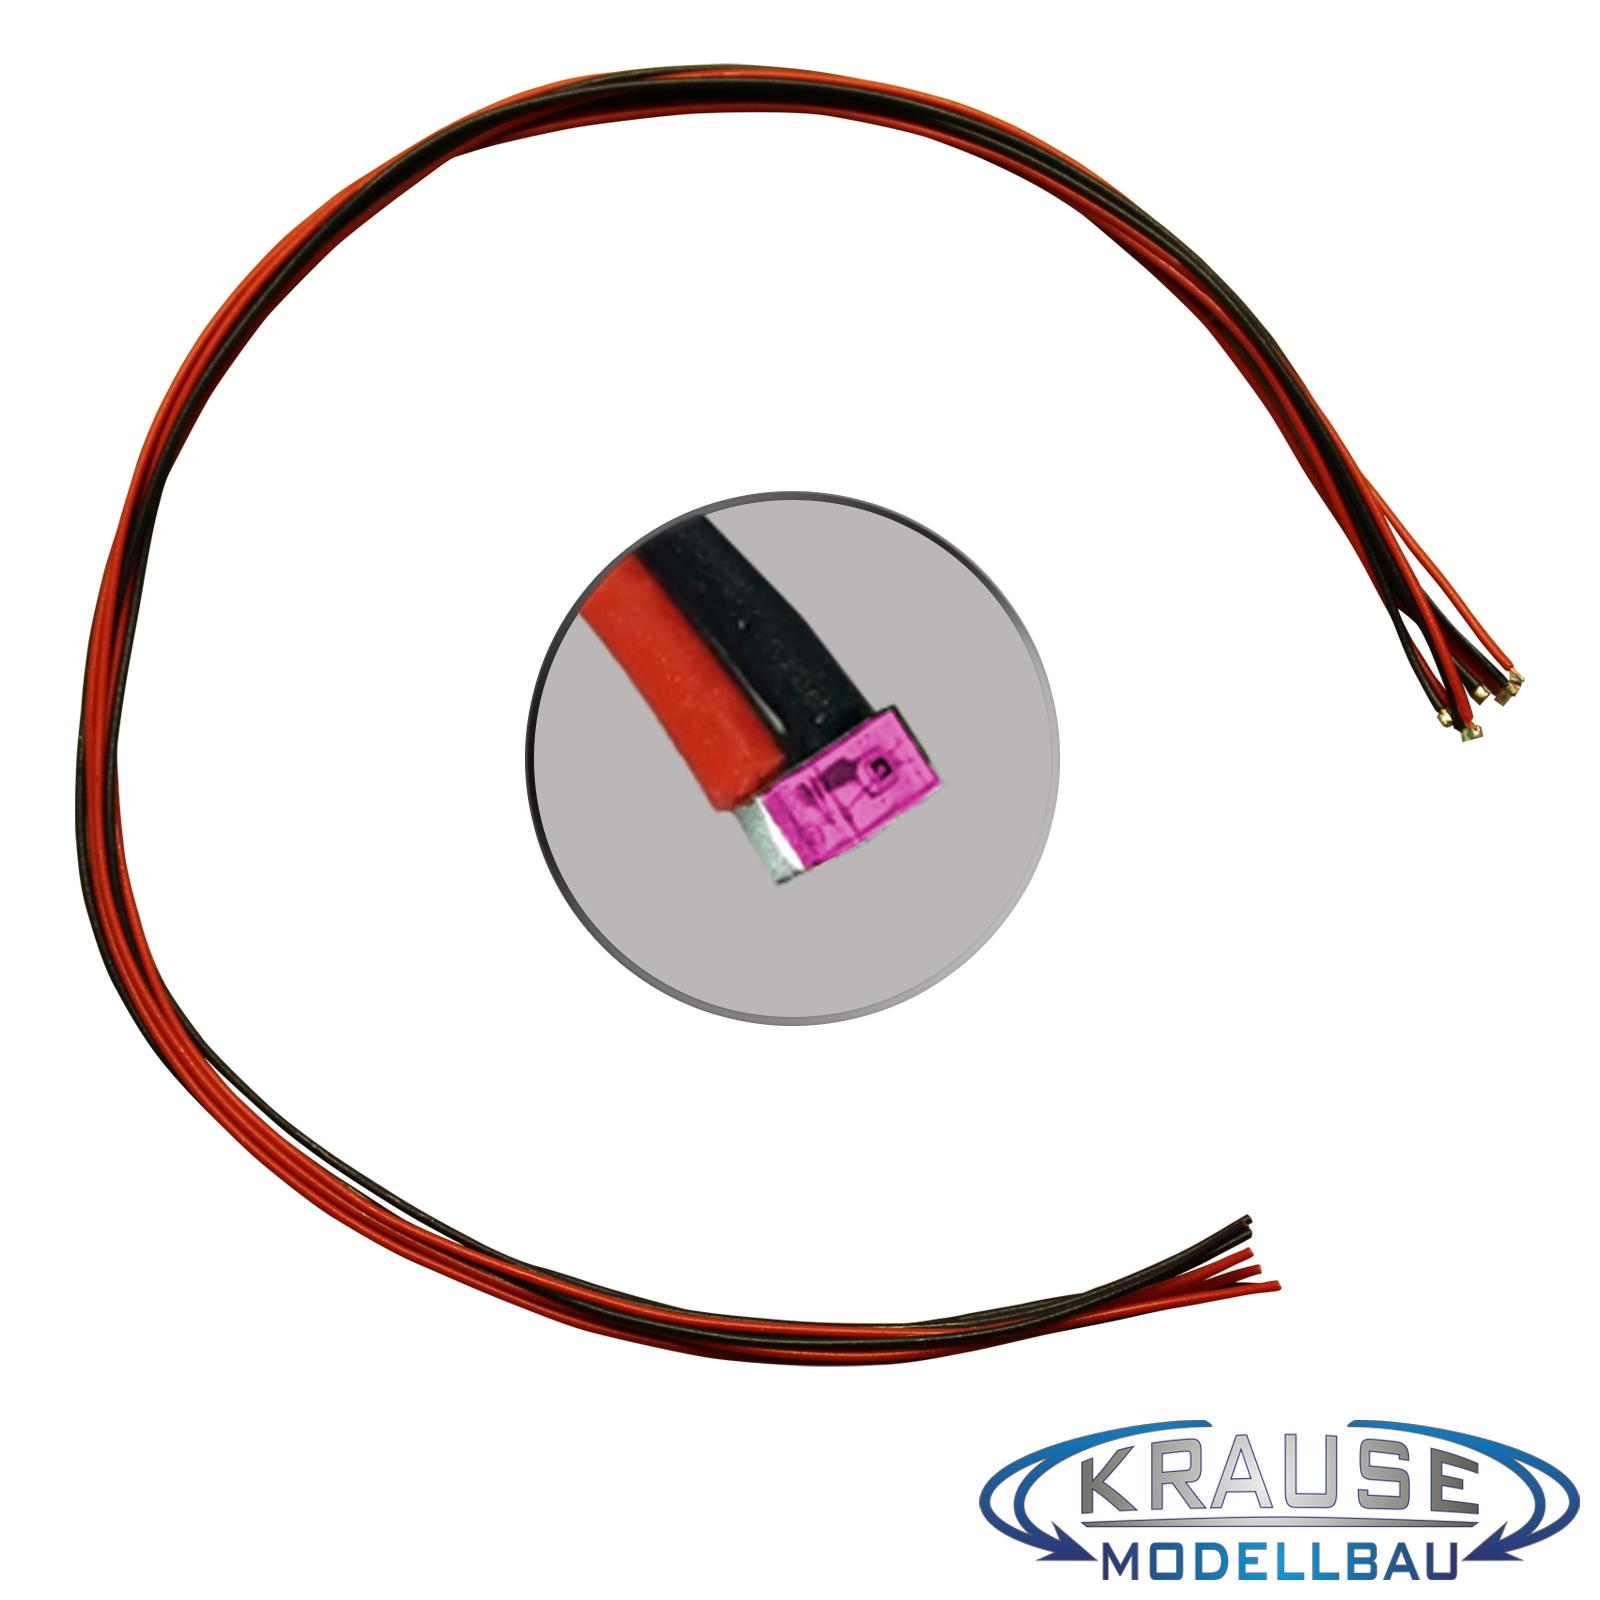 Krause Modellbau Shop - SMD-LED Typ 0603 pink, diffuses Gehäuse mit ...